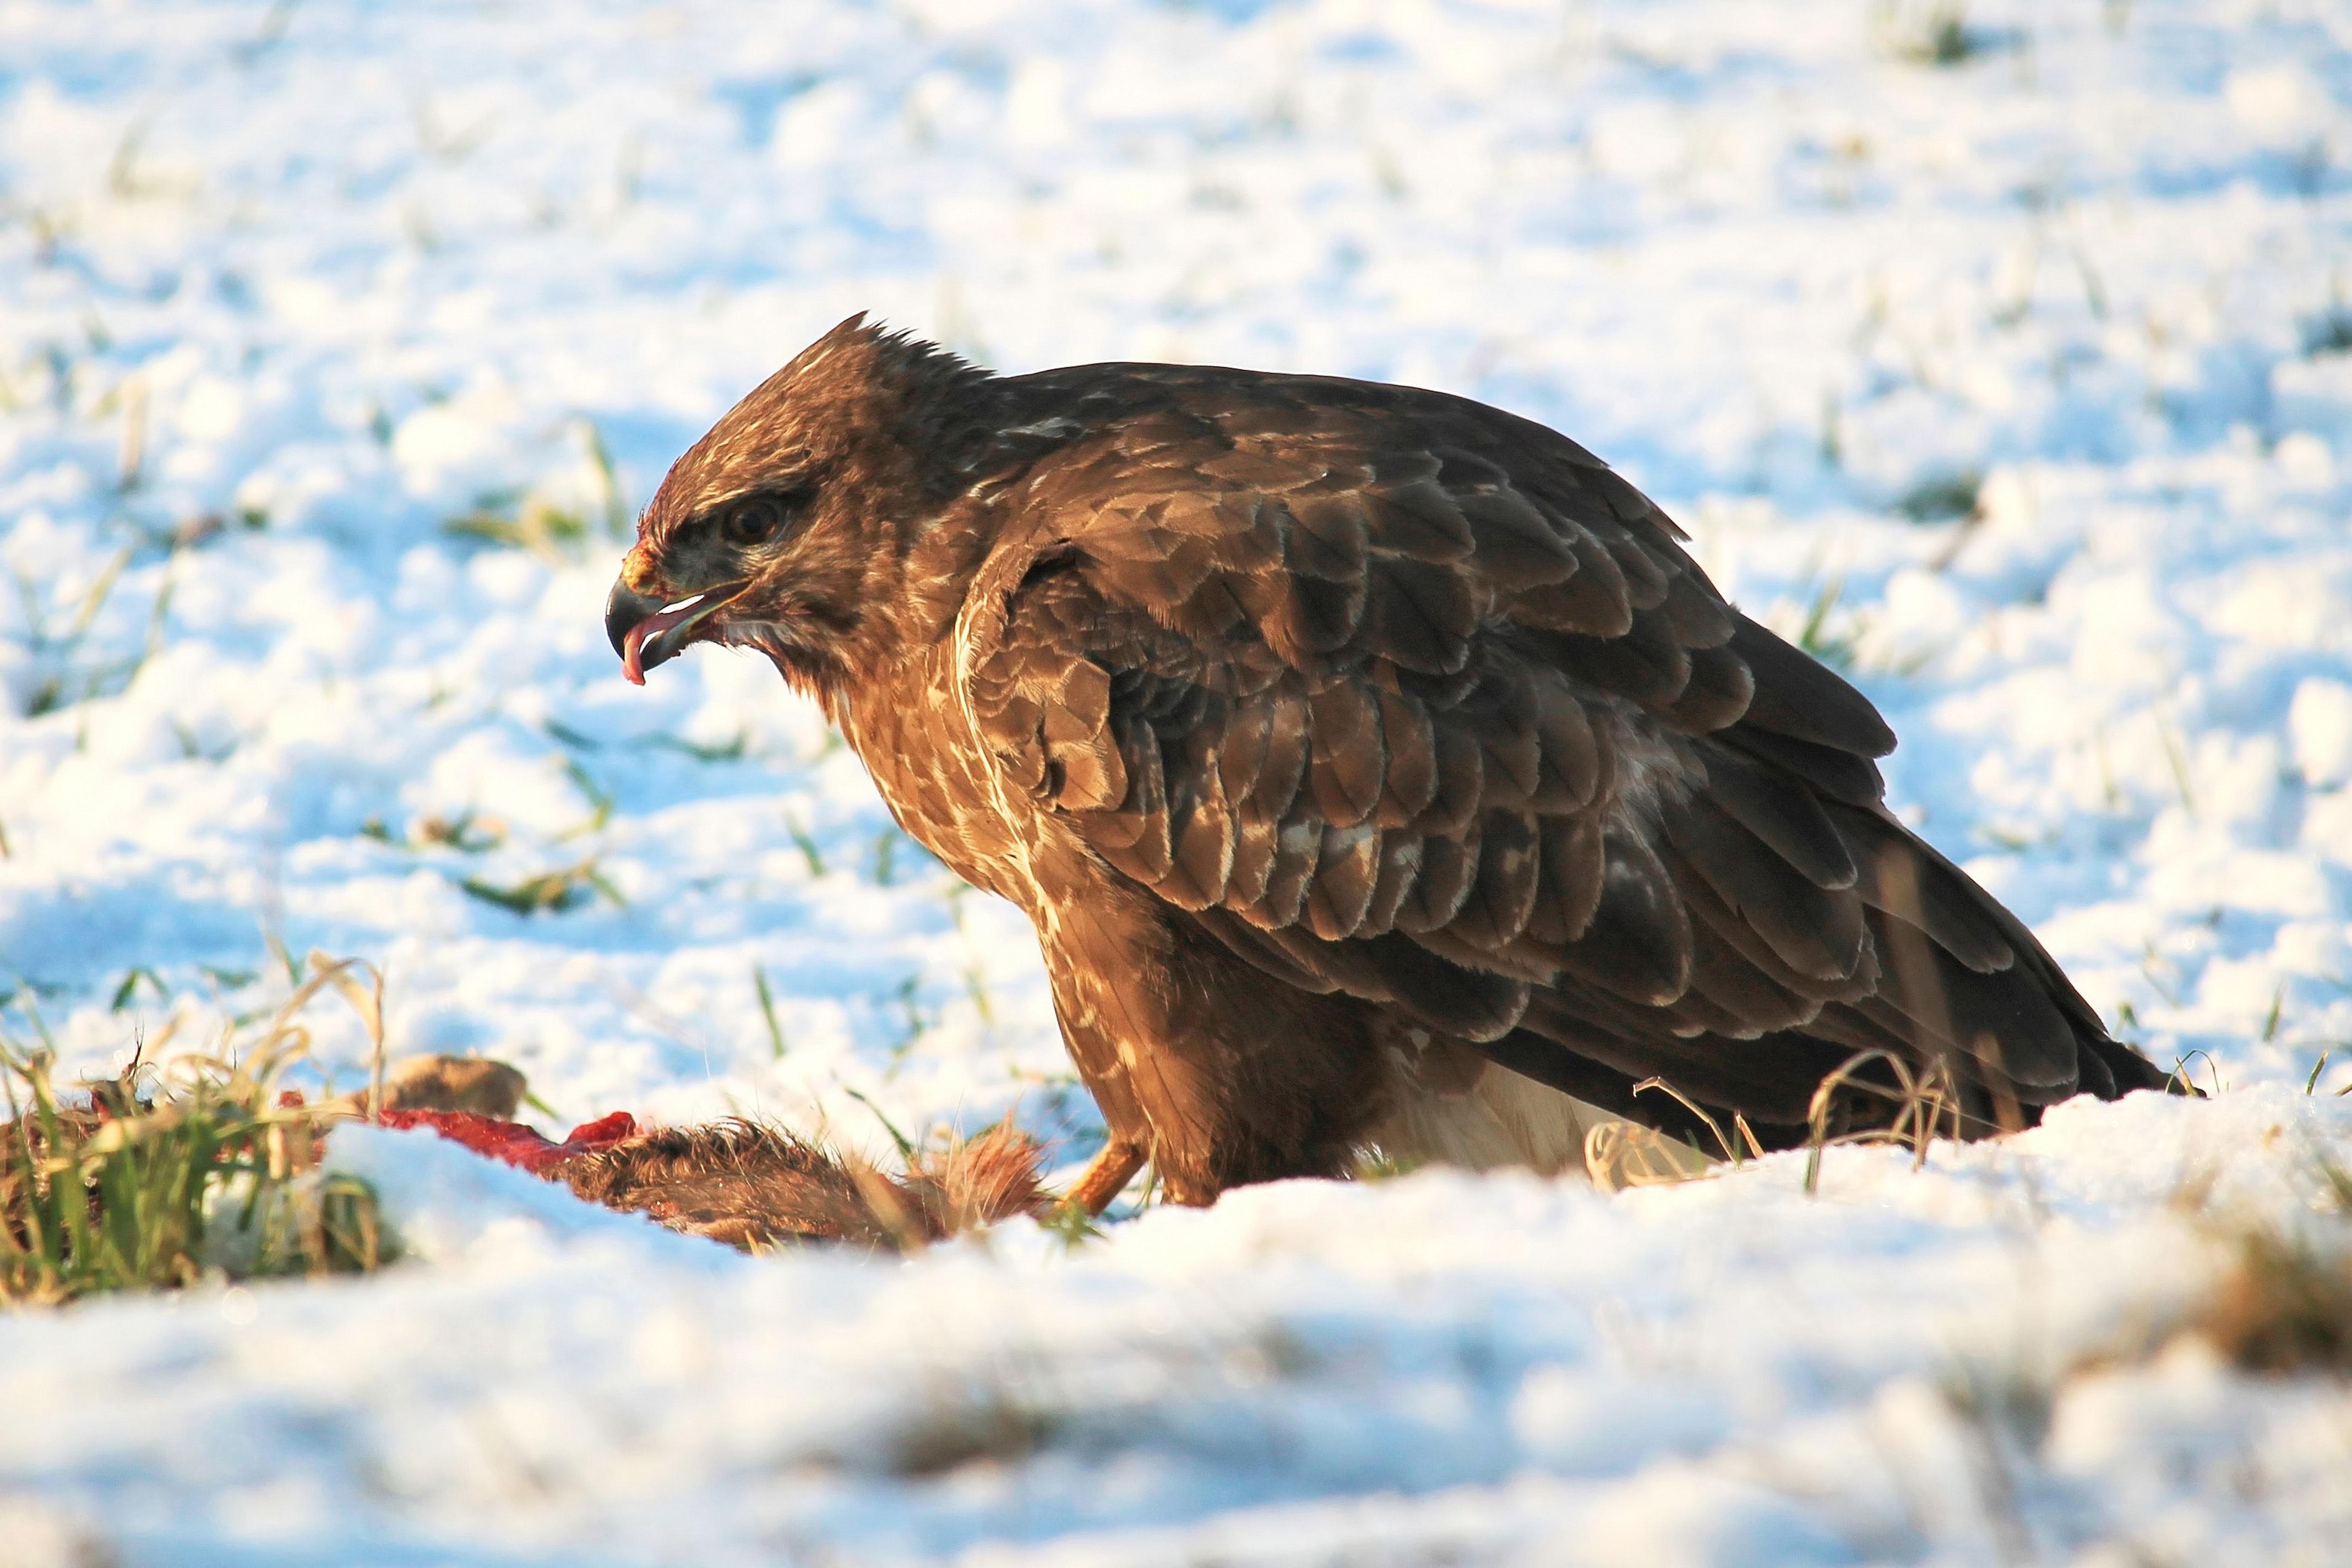 Close-up of Eagle, Flight, Winter, Wildlife, Wild, HQ Photo